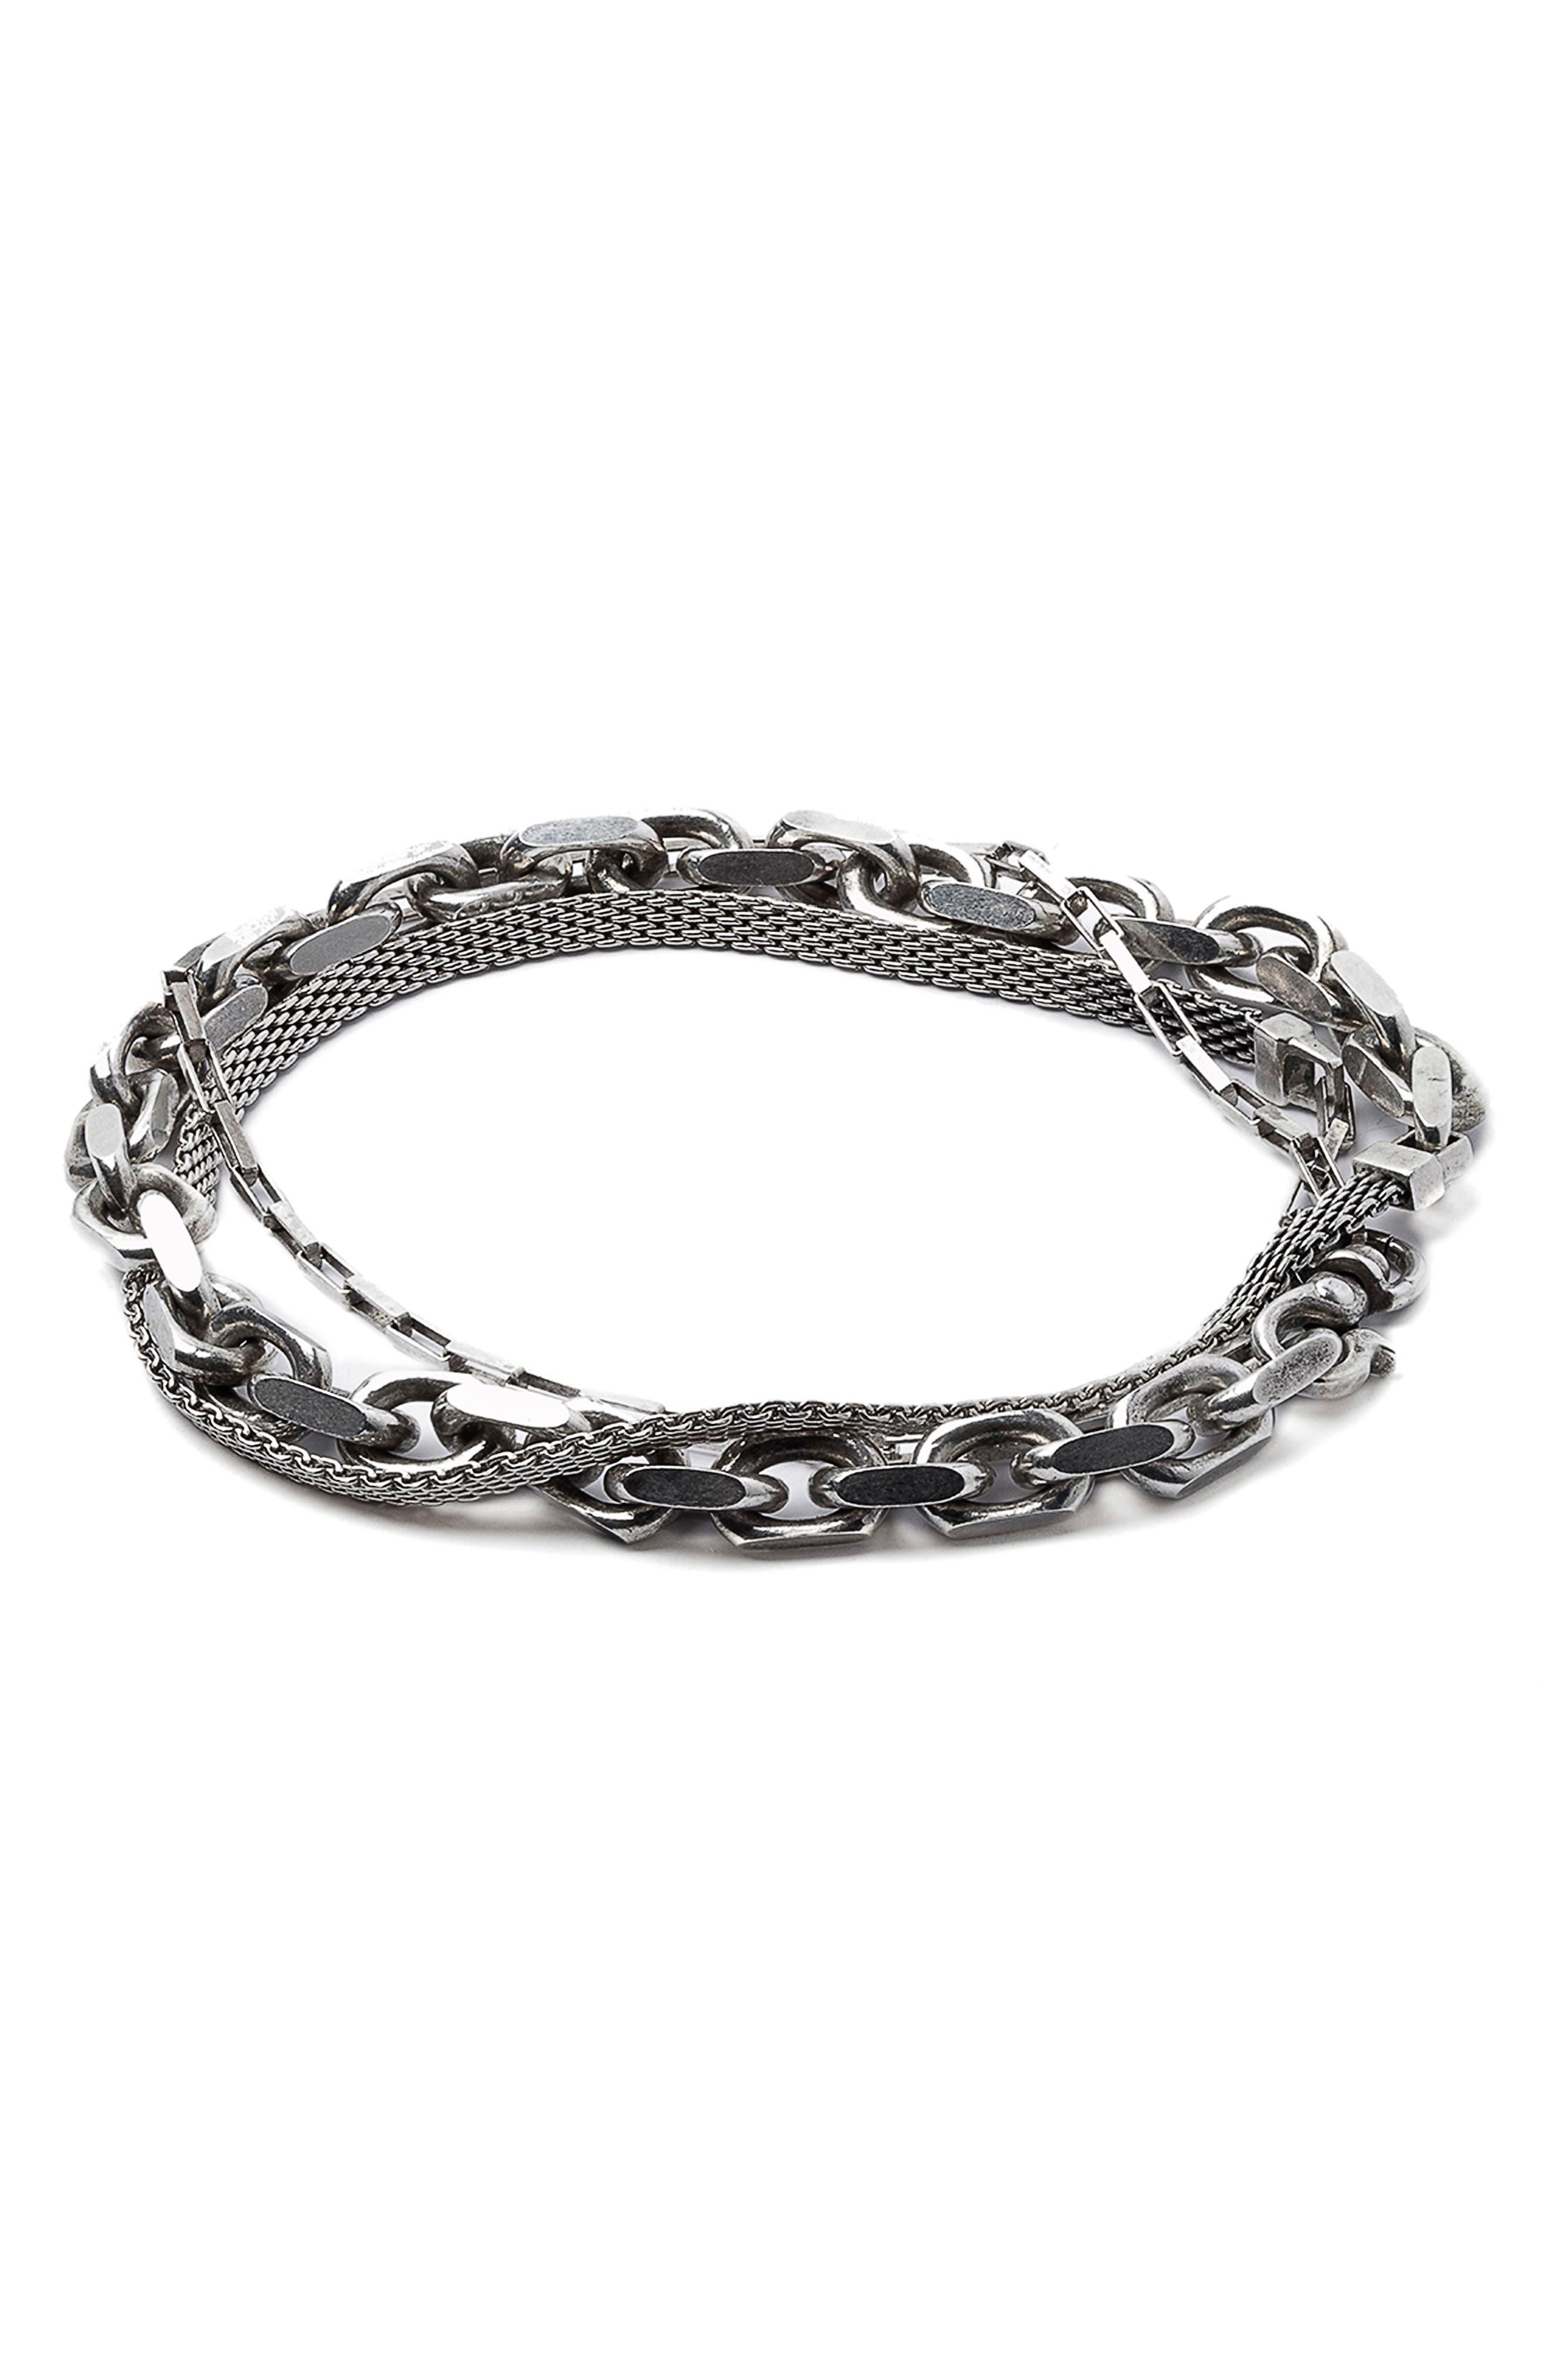 Triple Wrap Bracelet,                             Main thumbnail 1, color,                             SILVER